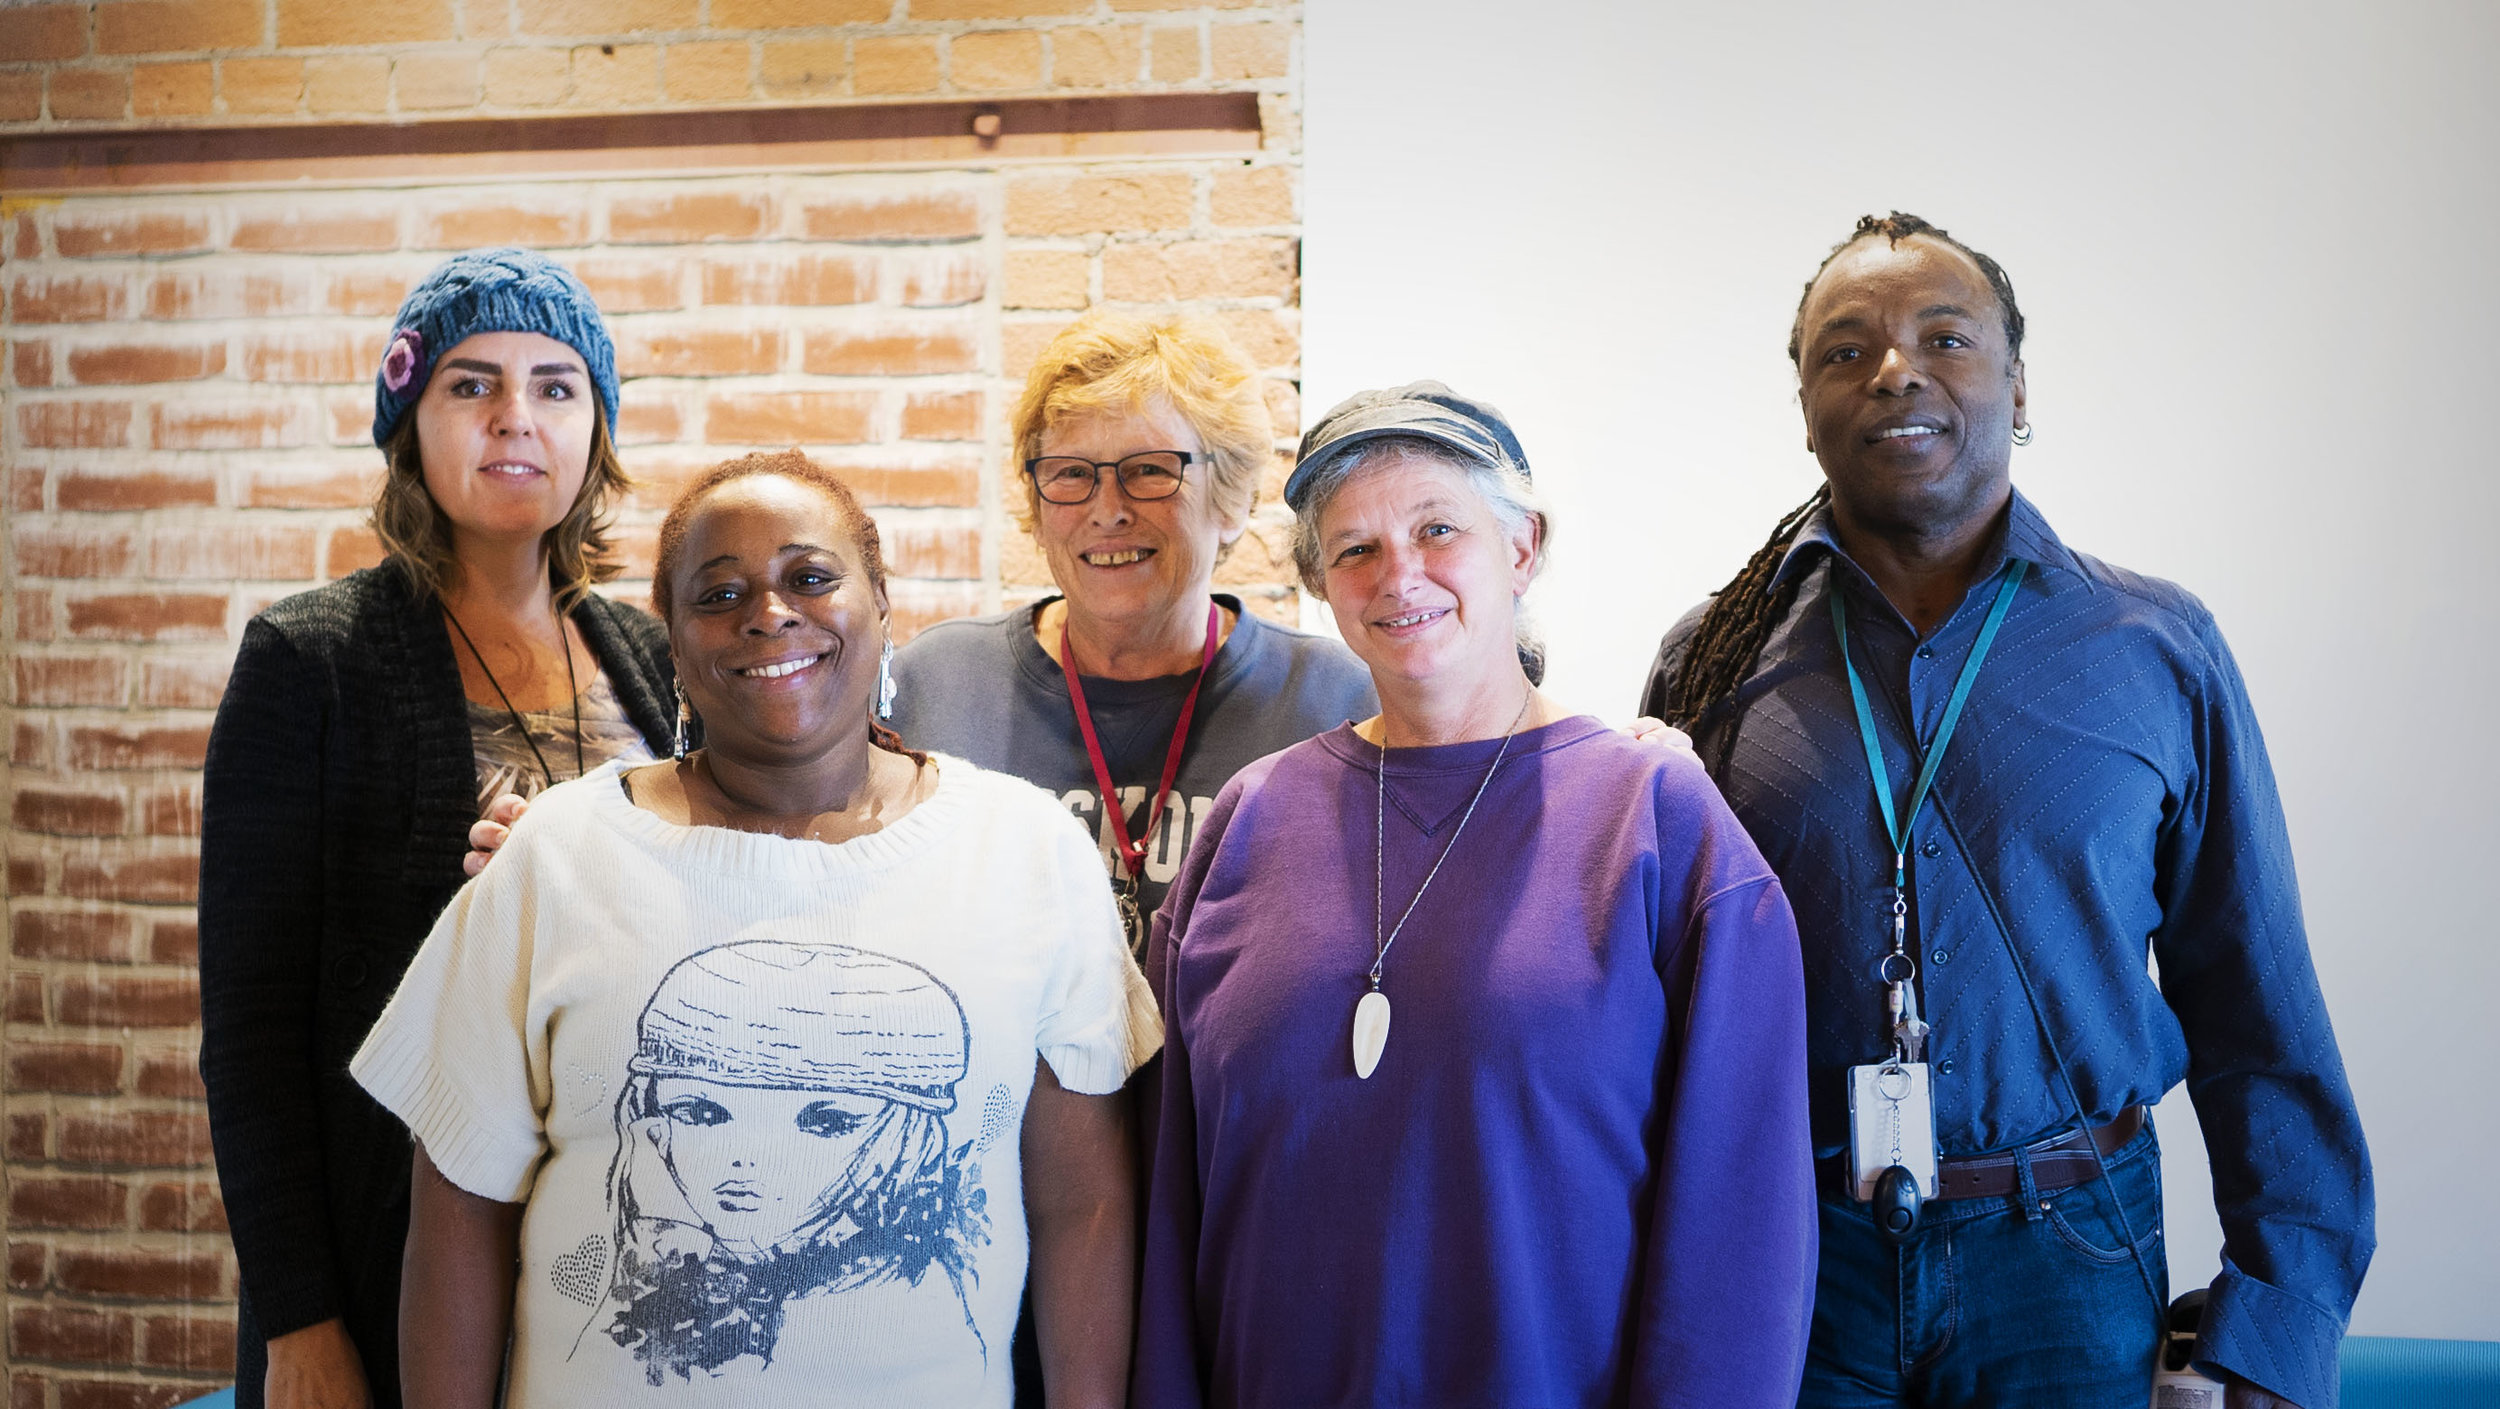 HEALTH, HOME AND COMMUNITY PROGRAM TEAM AT COTA